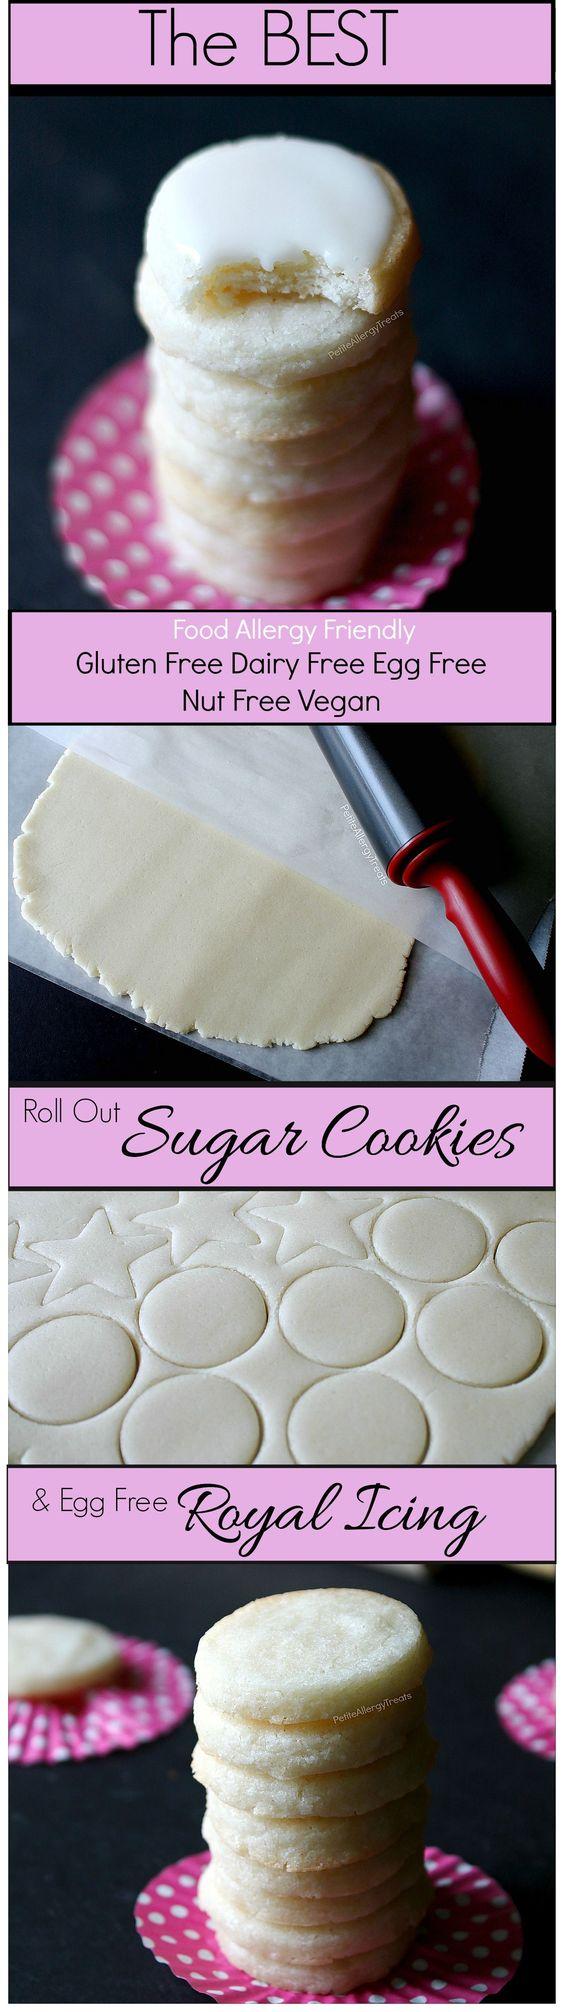 Easy egg free sugar cookie recipe